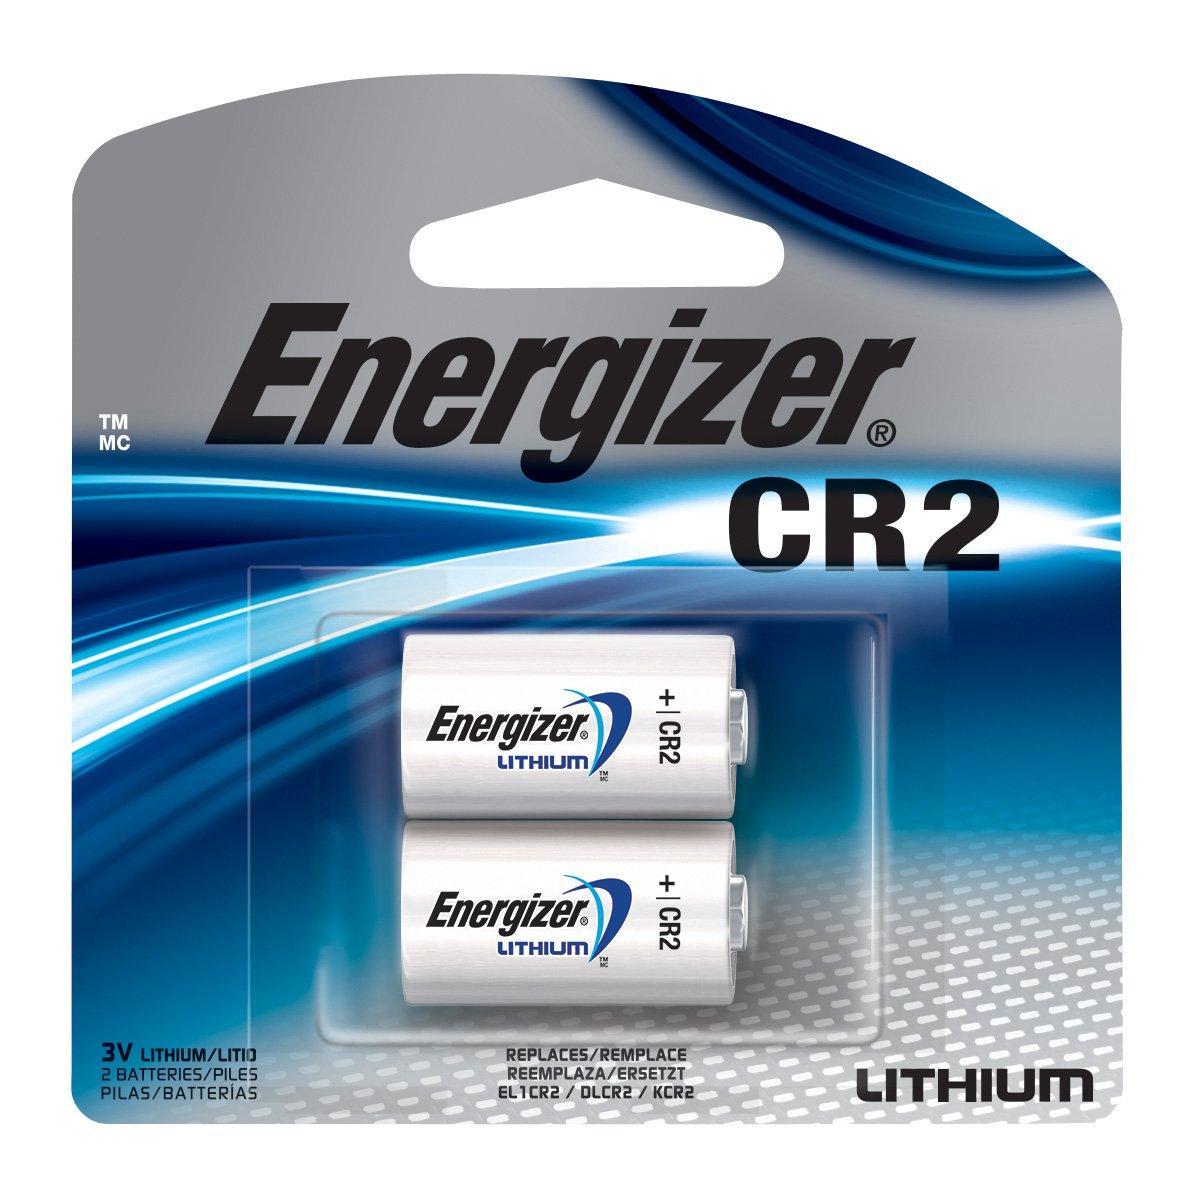 Energizer EL1CRBP-2 3-Volt Lithium Photo Battery (2-Pack) Energizer Batteries EL1CR2BP2